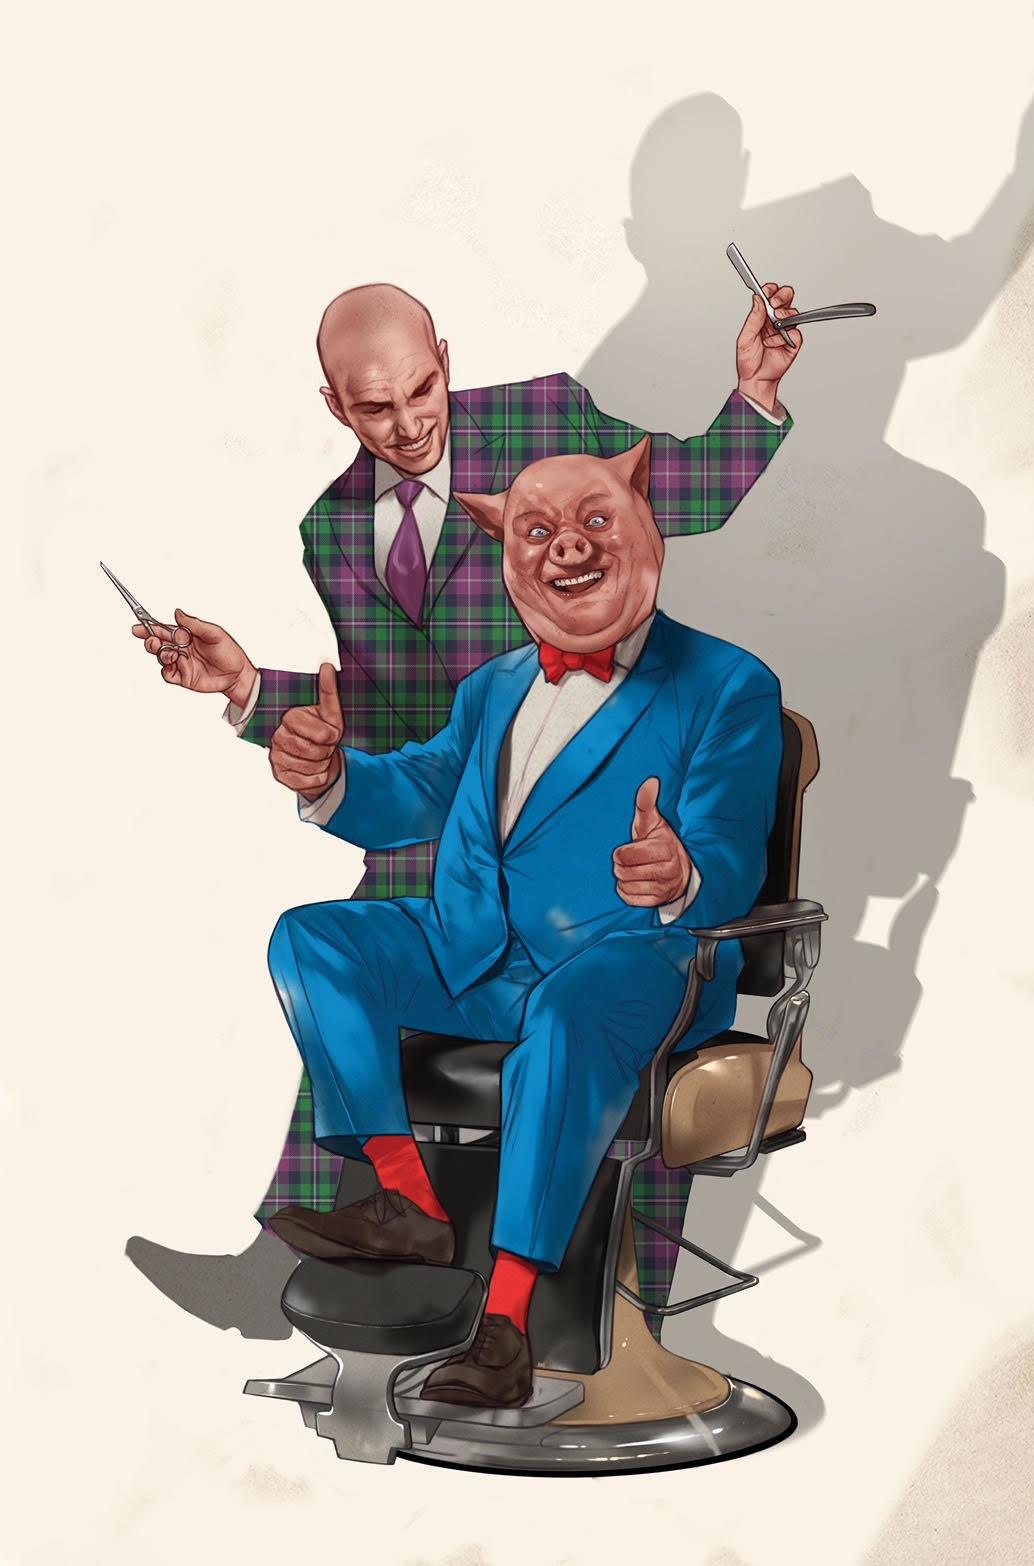 DC Looney Tunes, Lex Luthor Porky Pig